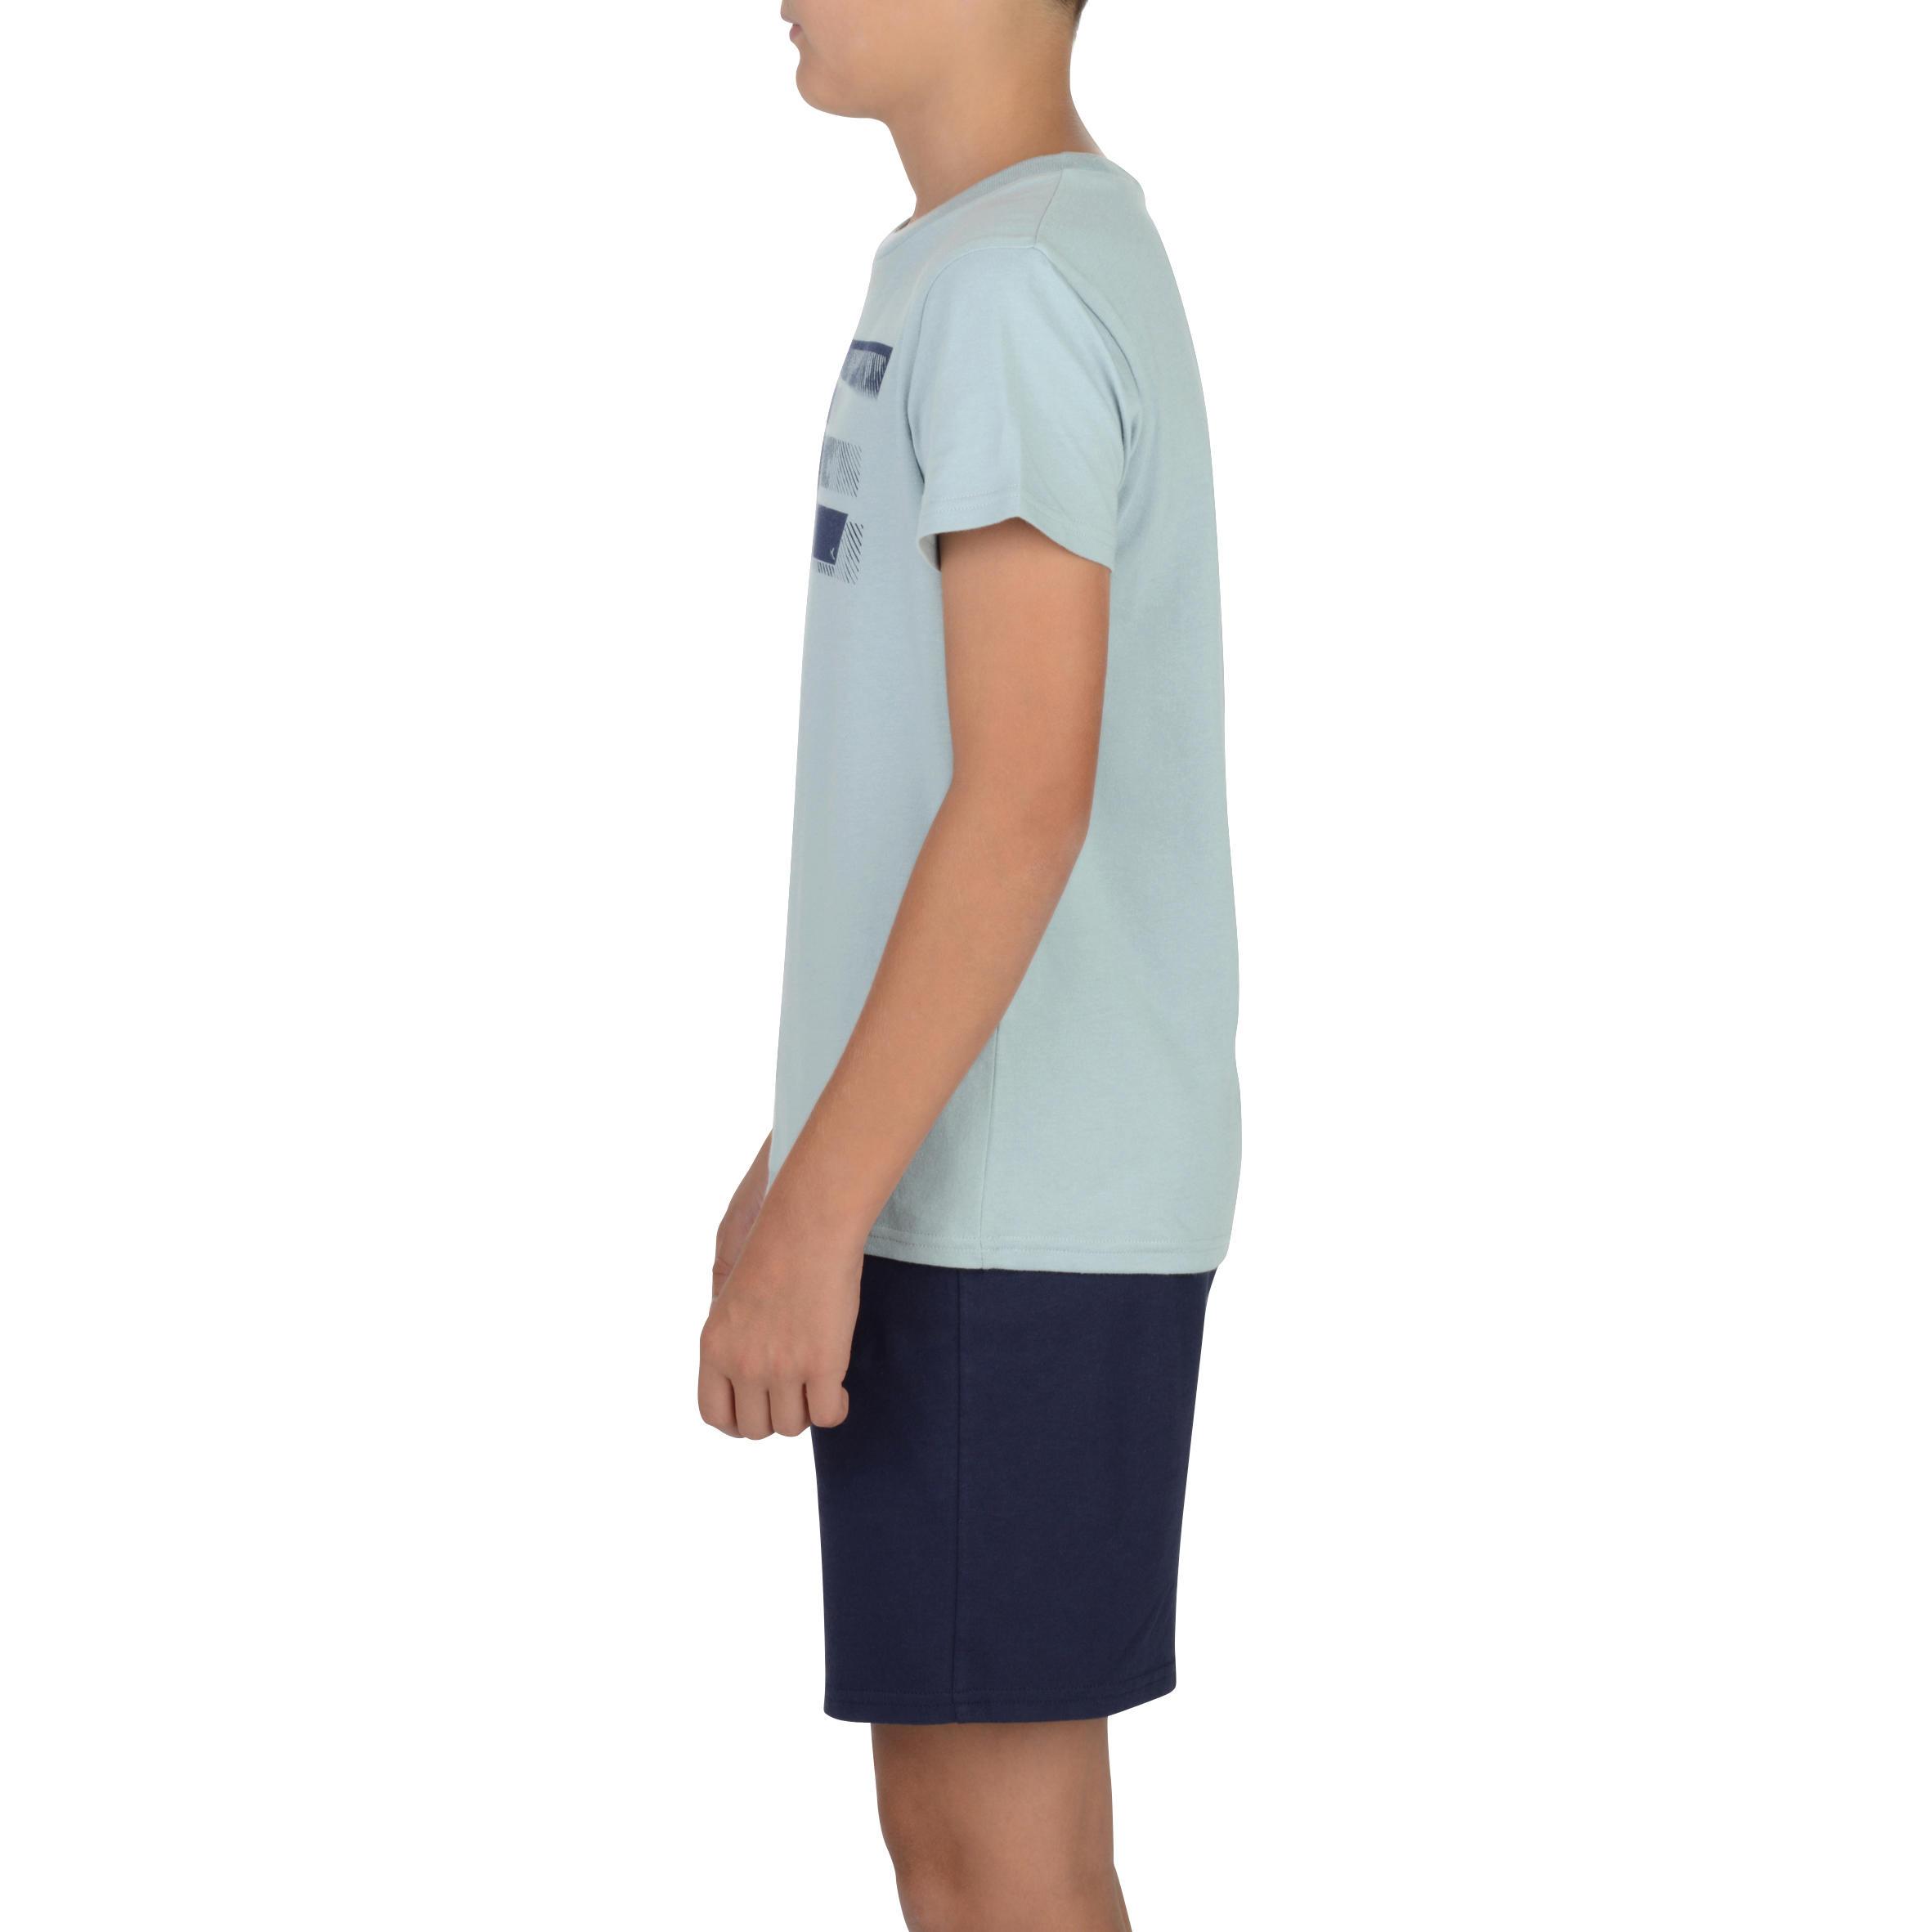 100 Boys' Gym Short-Sleeved T-Shirt - Grey Print